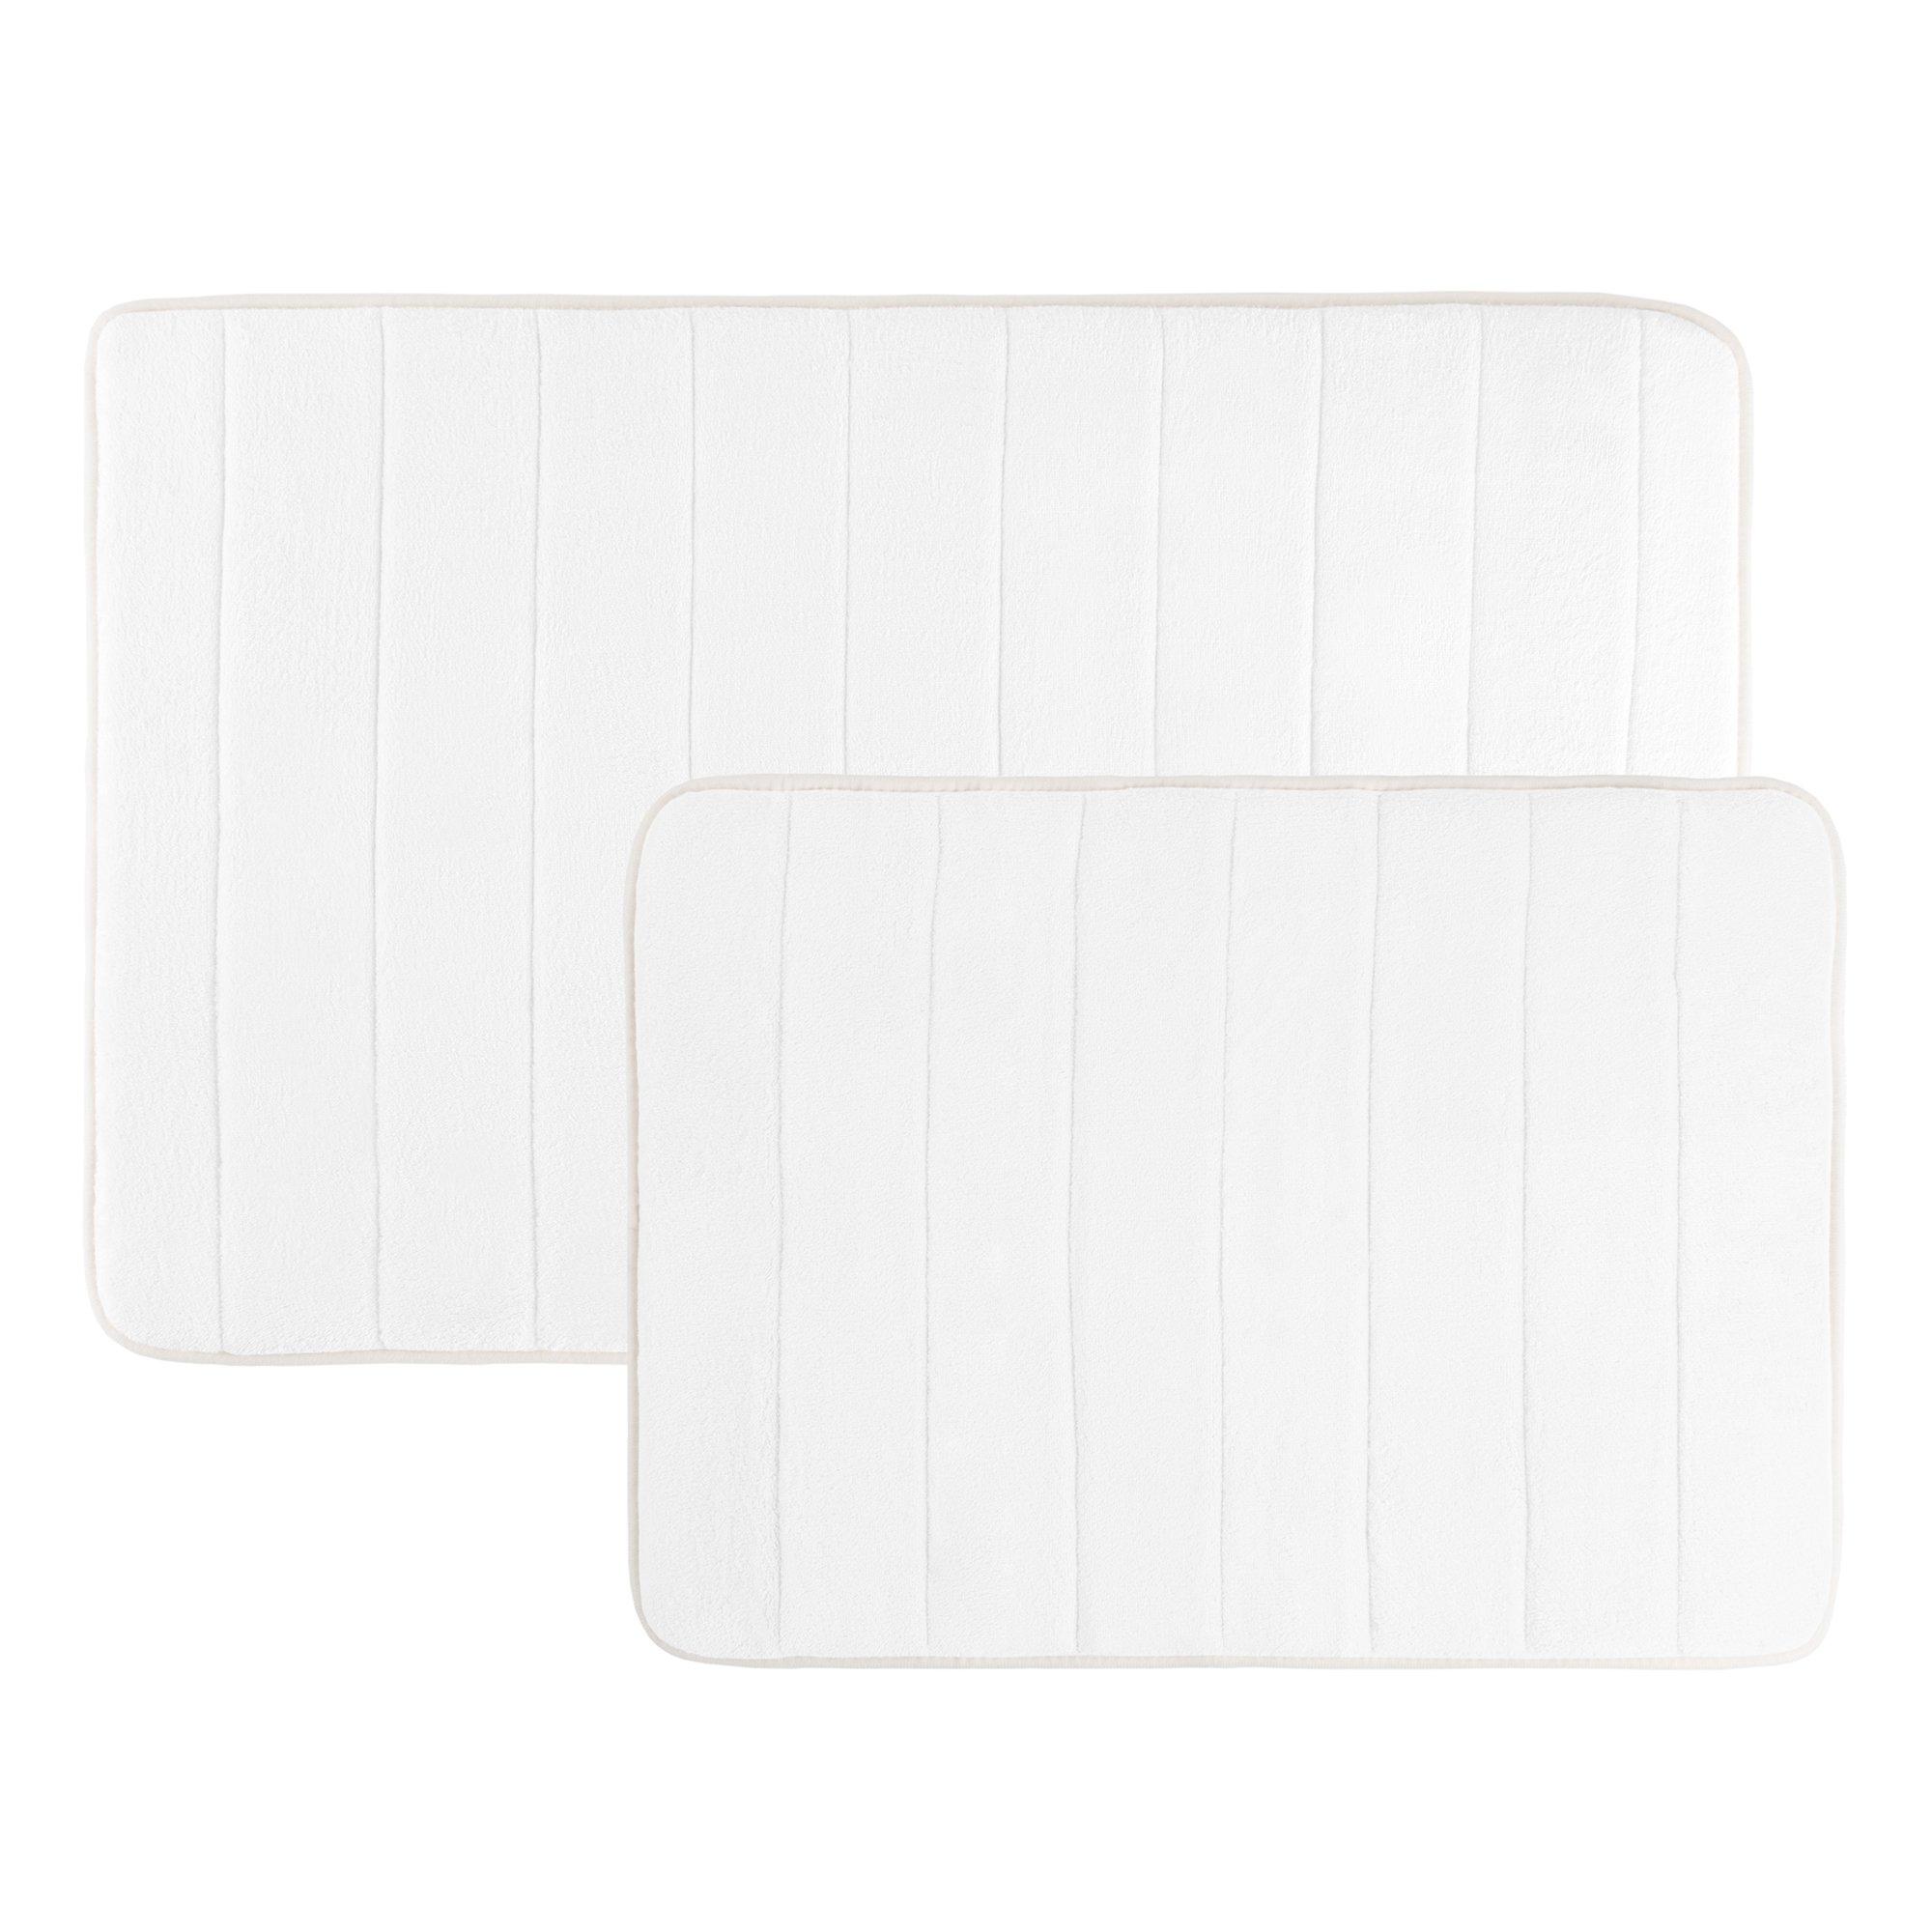 Lavish Home Memory Foam Bath Mats, Non Slip and Fast Dry 2 Piece Bathroom Mat Set- Absorbent Hydro Grip Designed Bath Rug By (White)